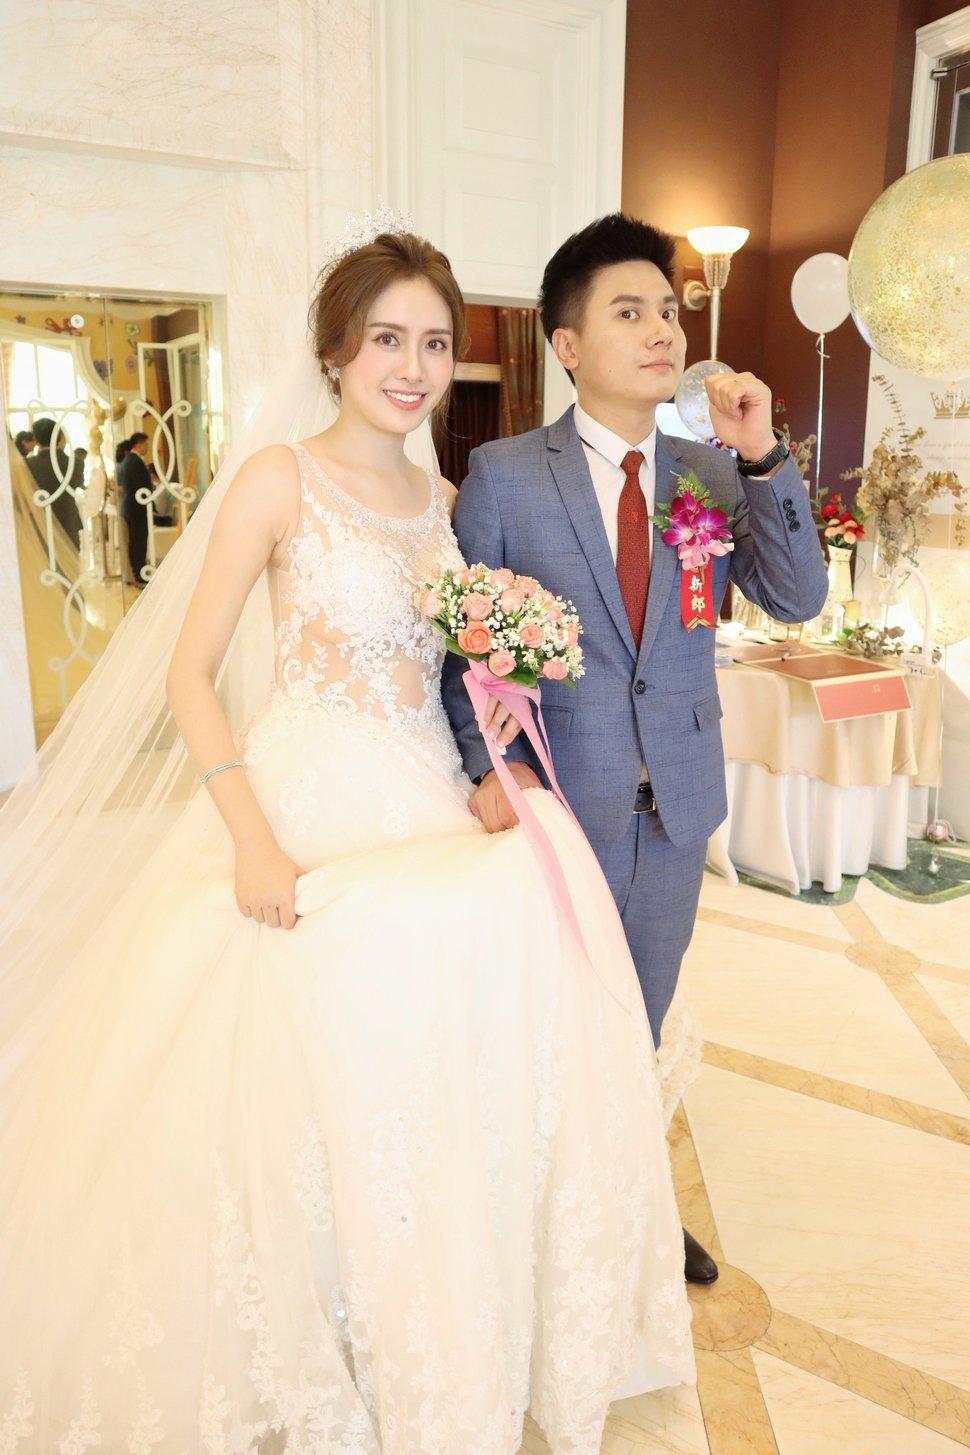 5FE83AC0-2DE4-4224-A90A-9B23E4545578 - 台中/台南新秘可可 新娘精緻彩妝整體造型《結婚吧》